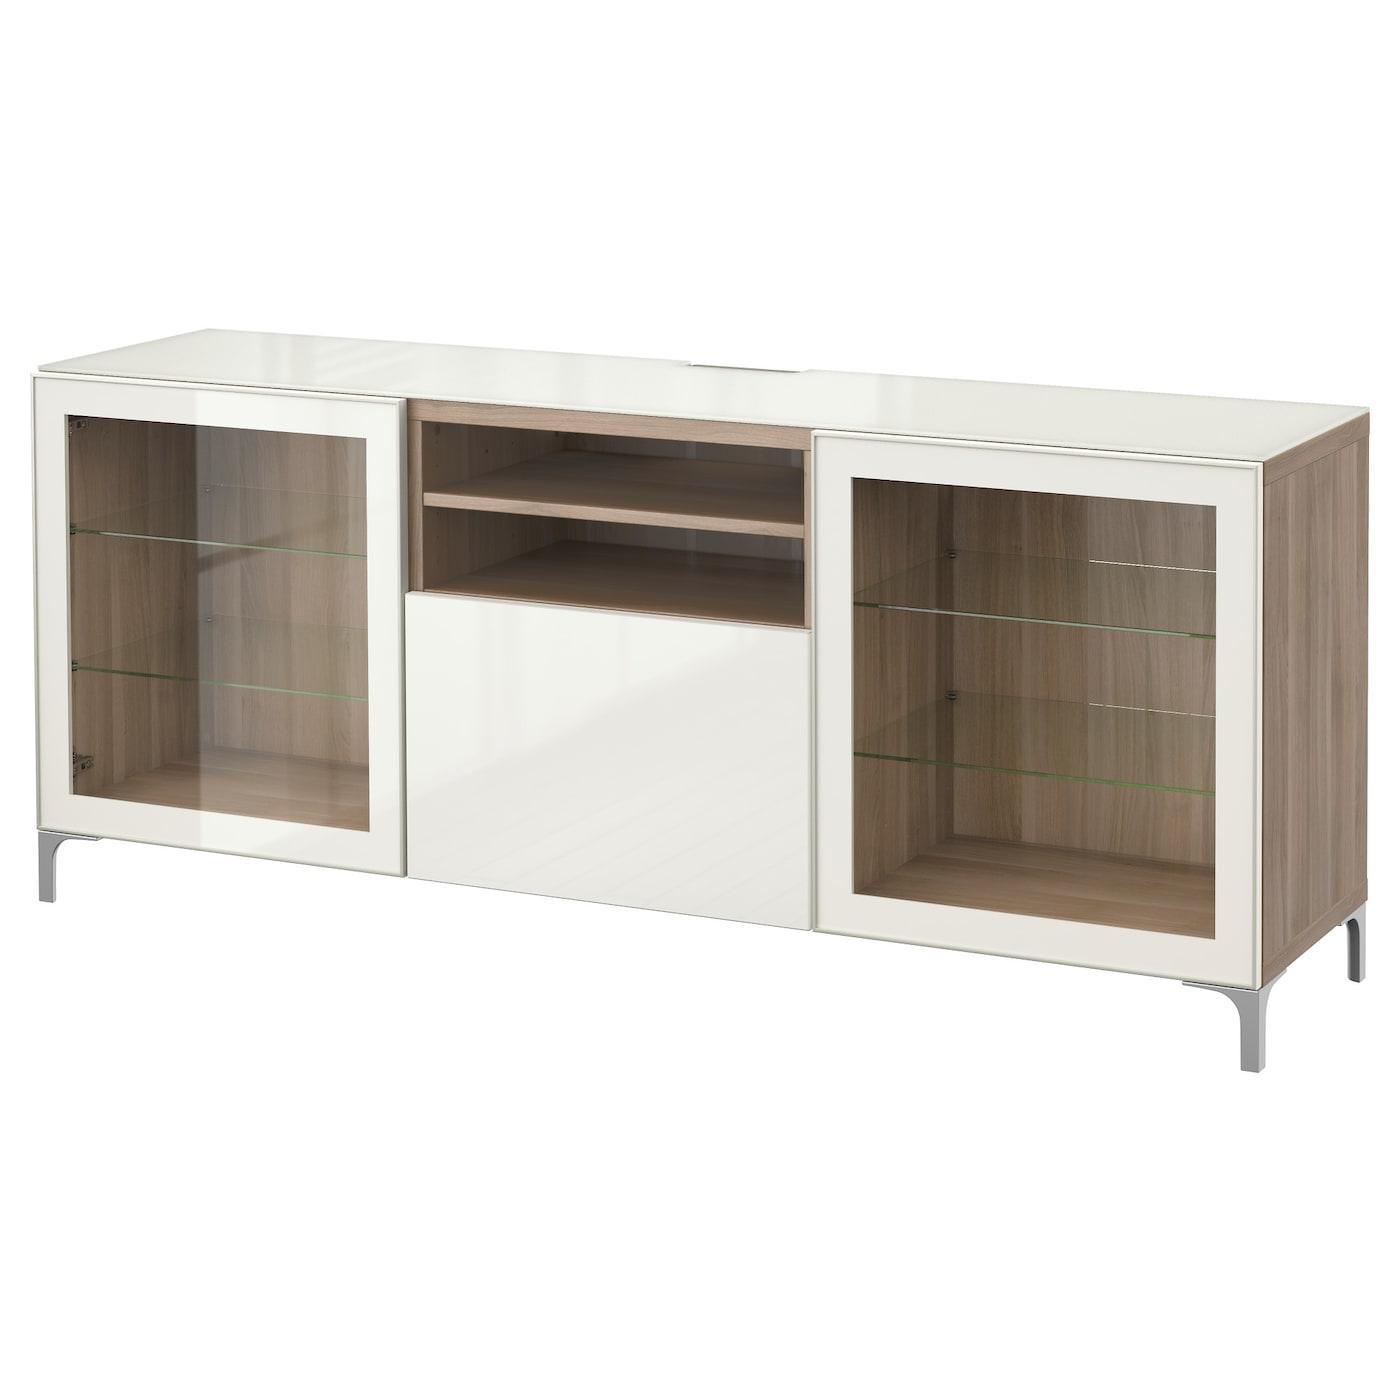 Best Banc Tv Motif Noyer Teint Gris Selsviken Brillant Blanc  # Meuble Tv Ikea Pas Cher